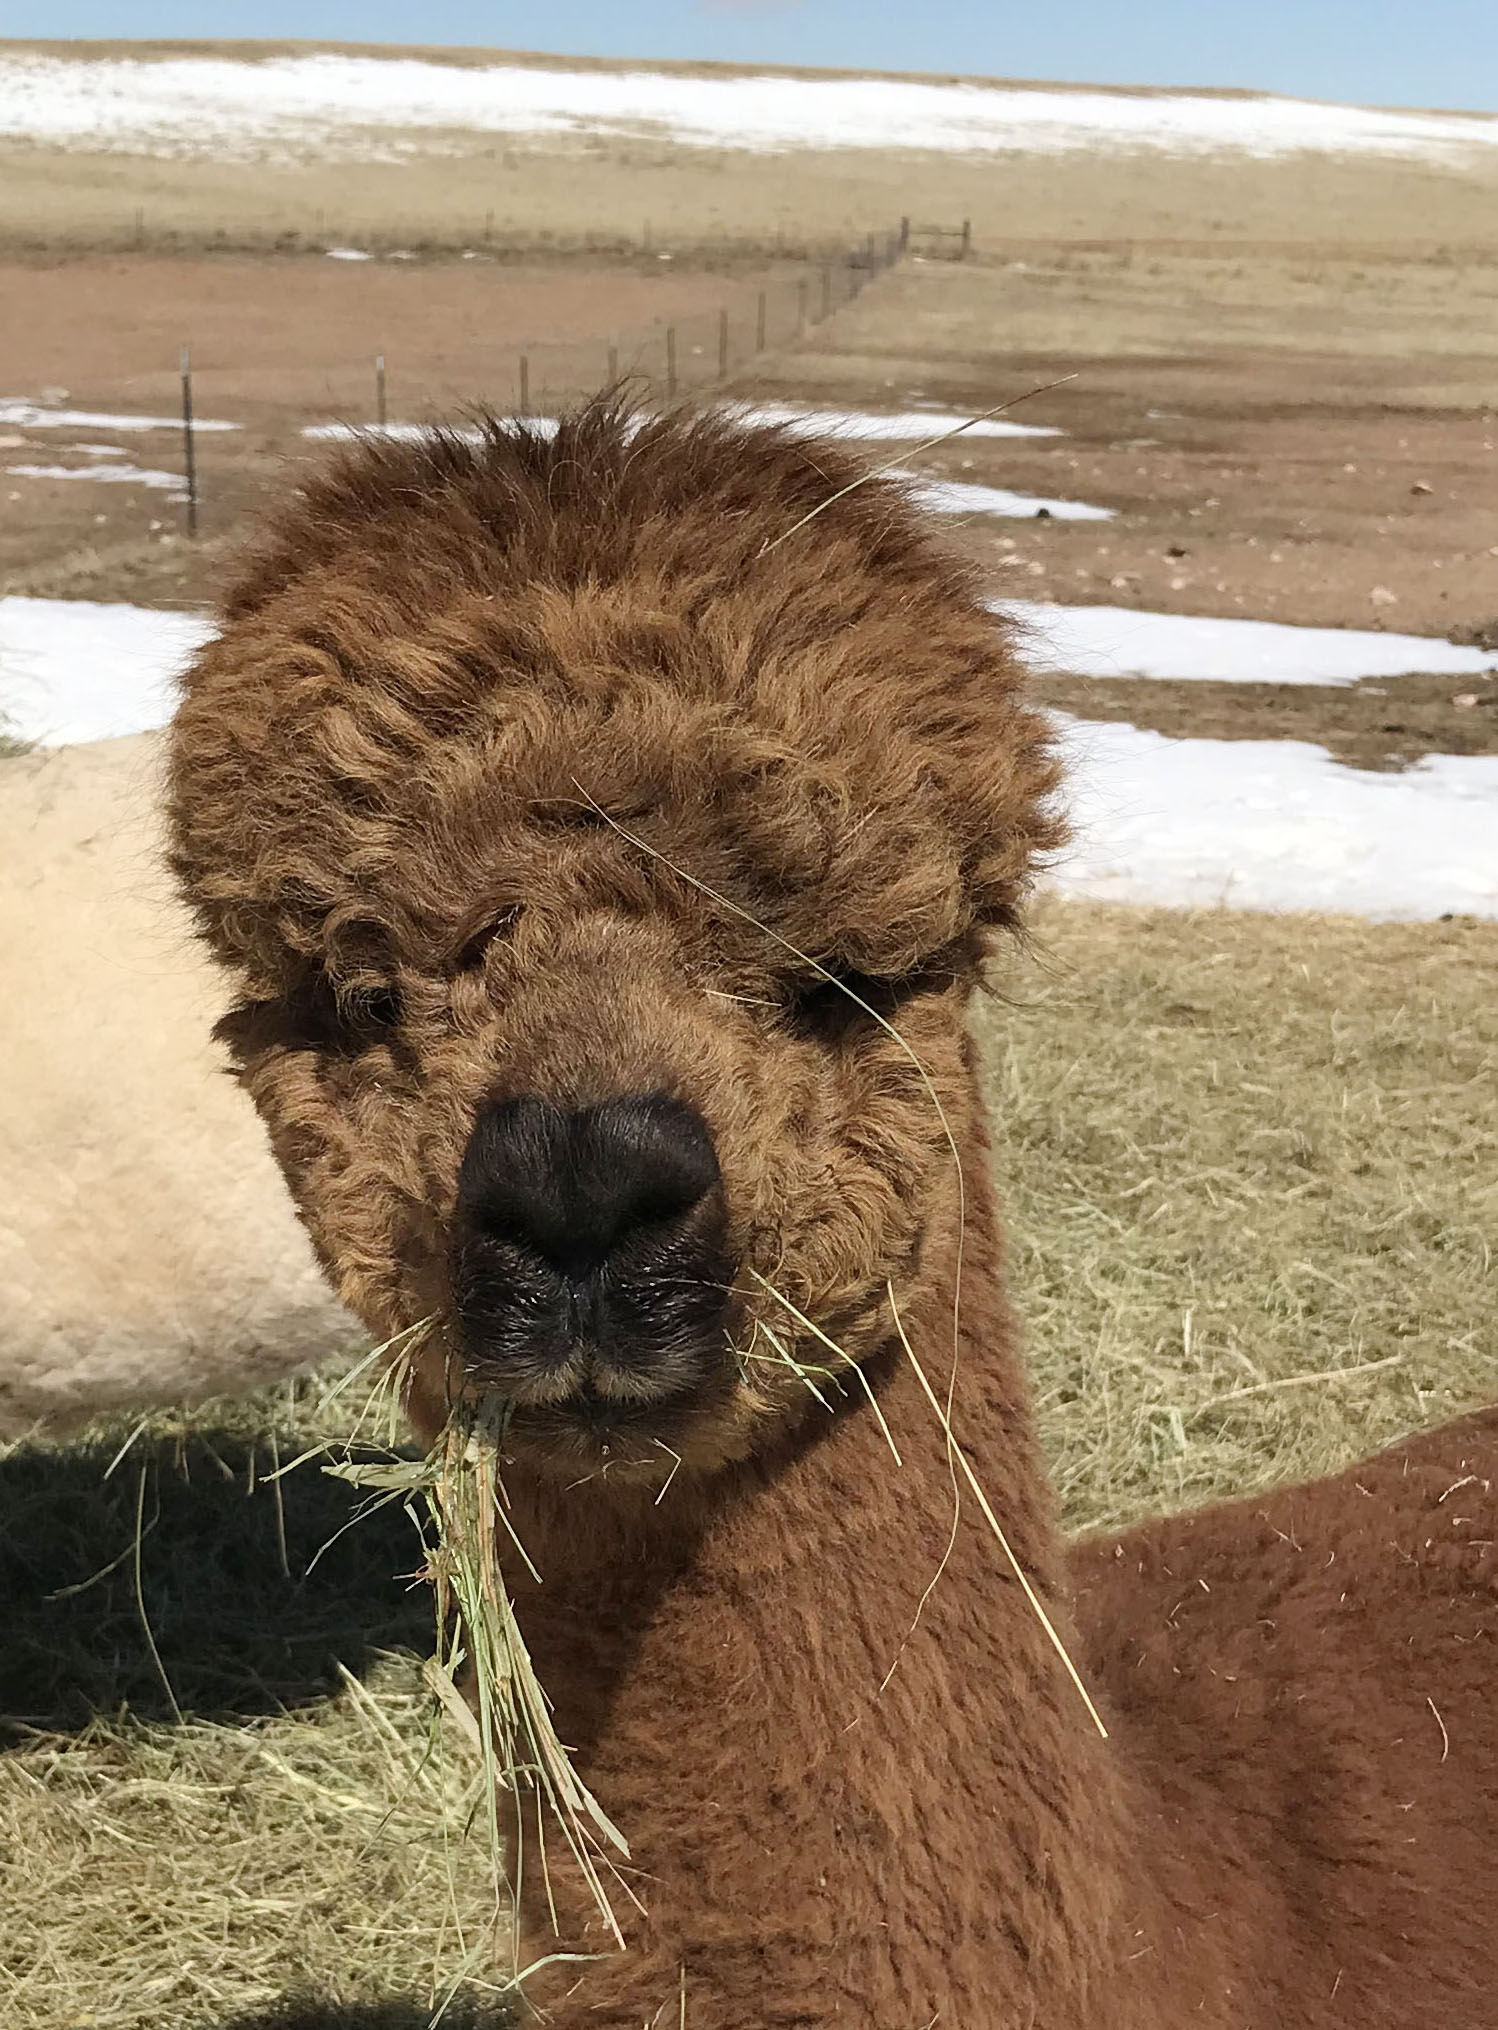 Toby the alpaca